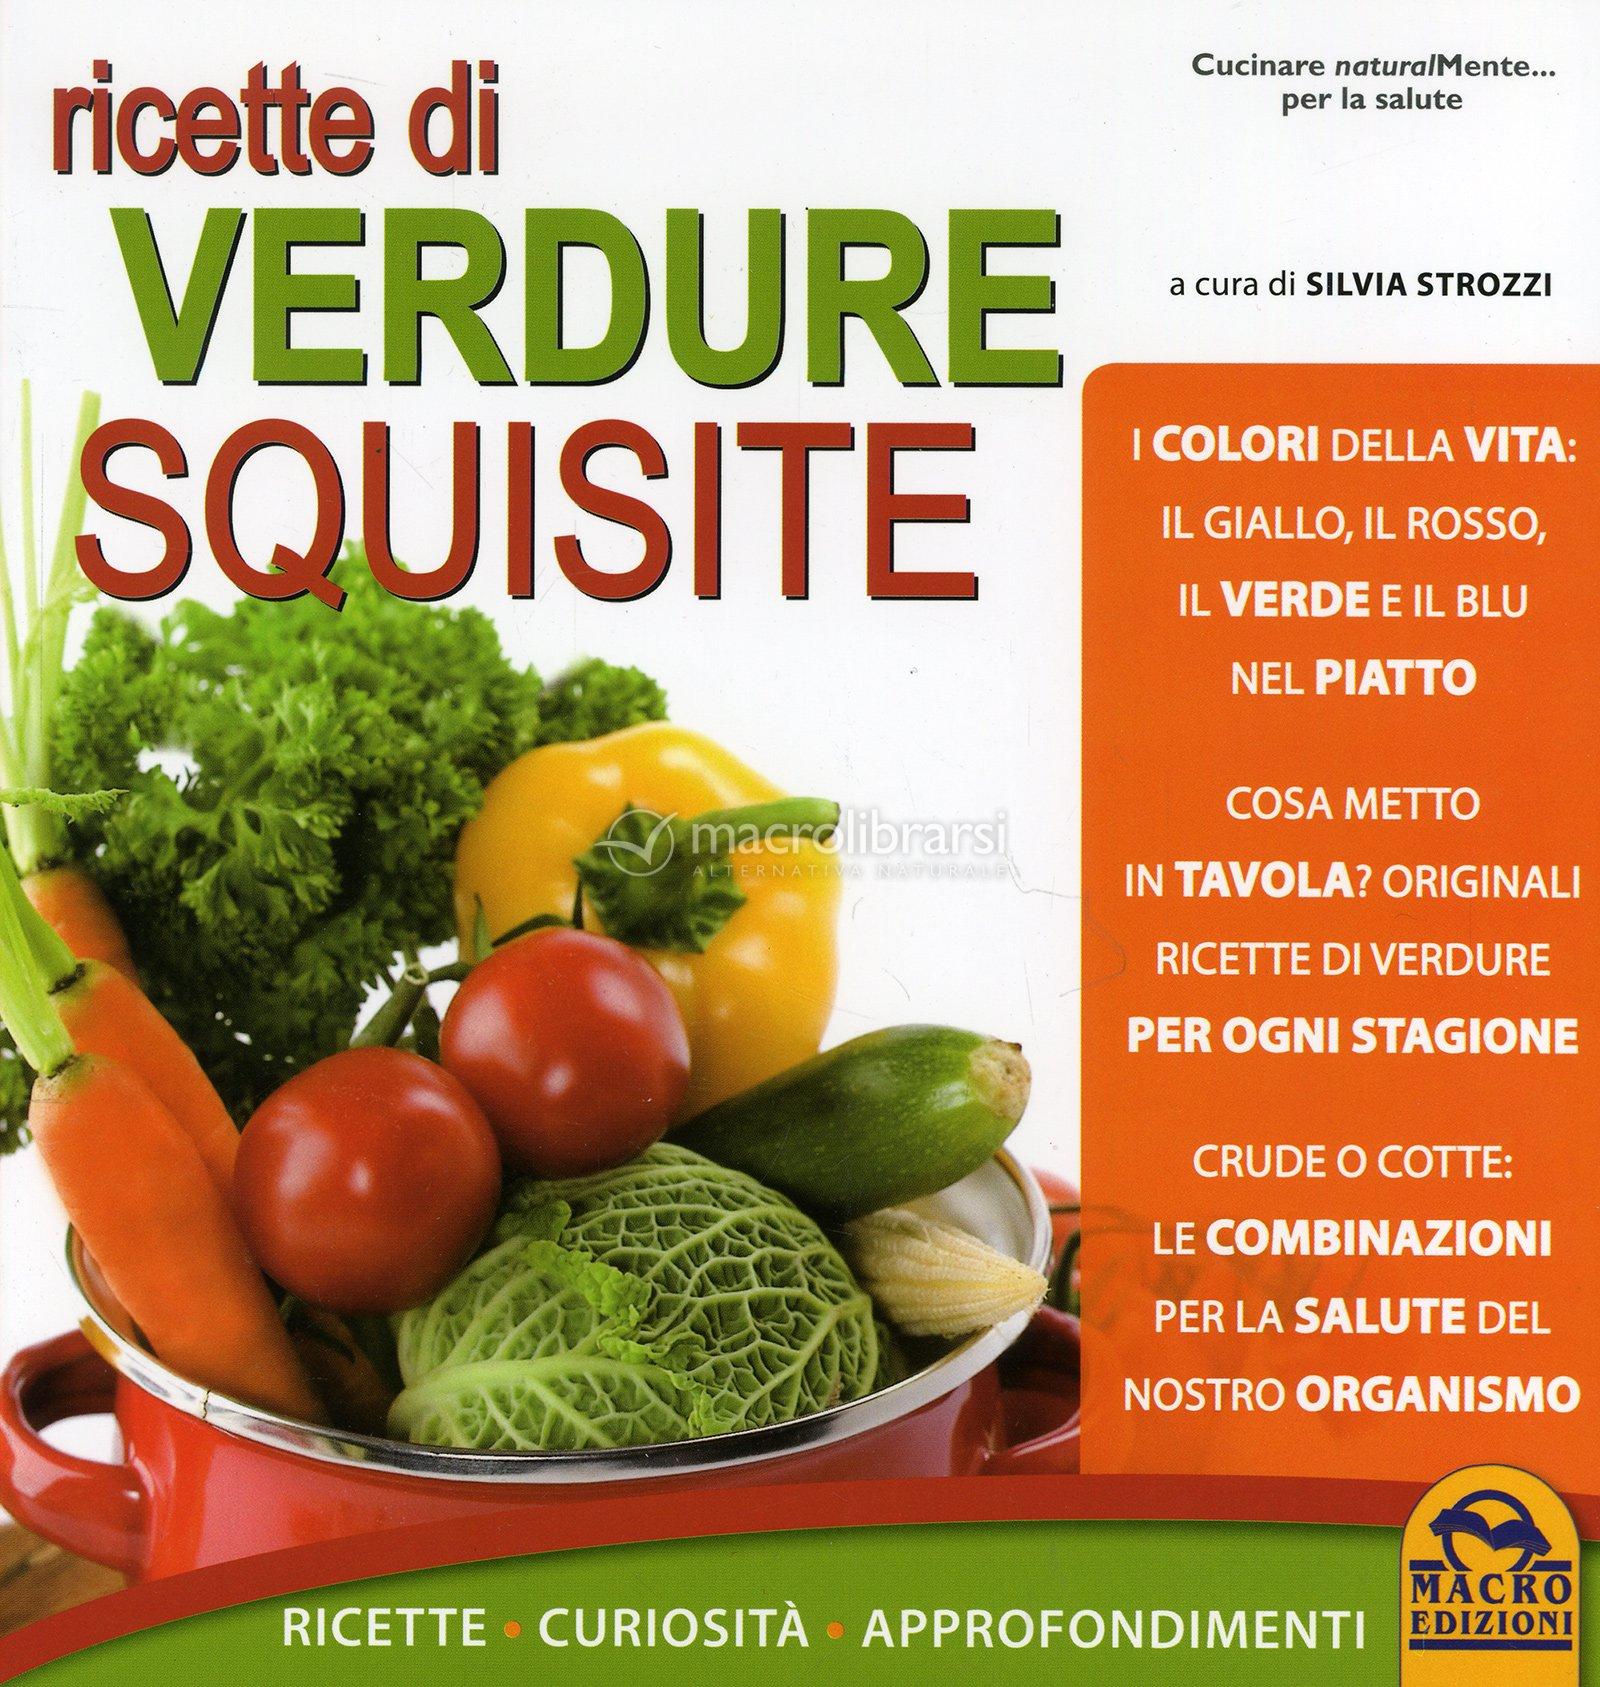 Ricette di verdure squisite silvia strozzi for Ricette di verdure